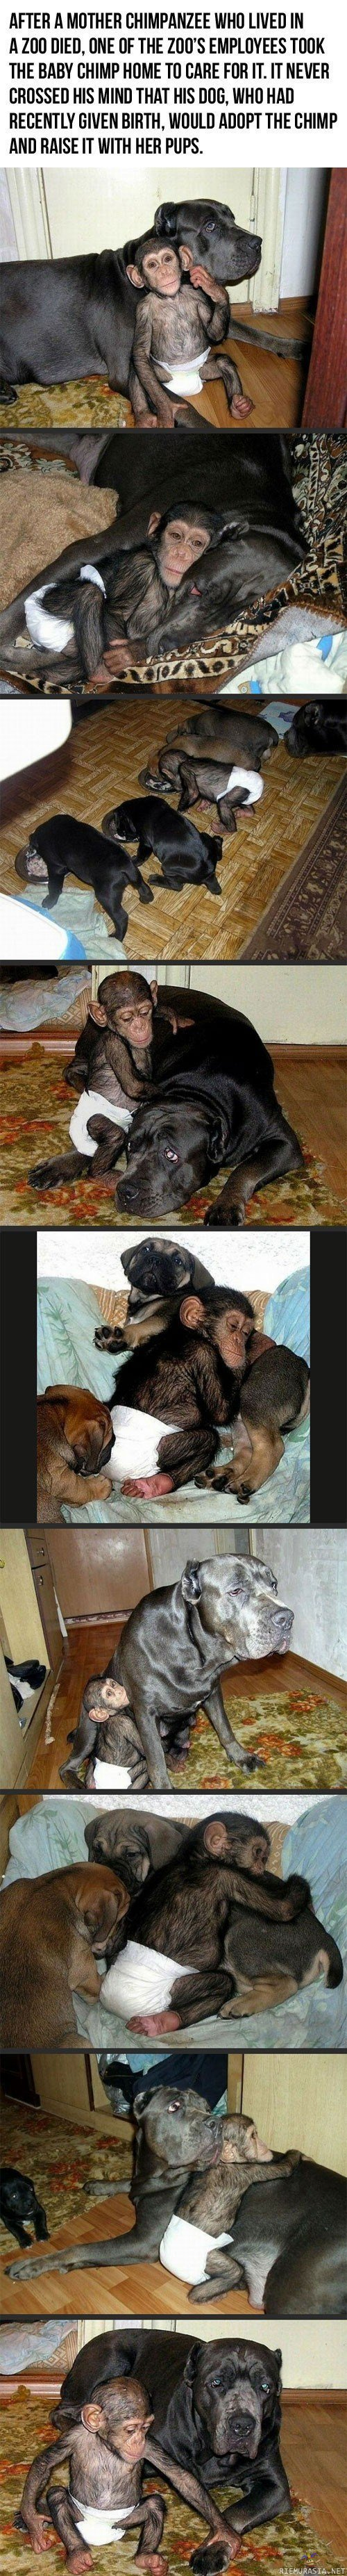 Adoptoi Koira